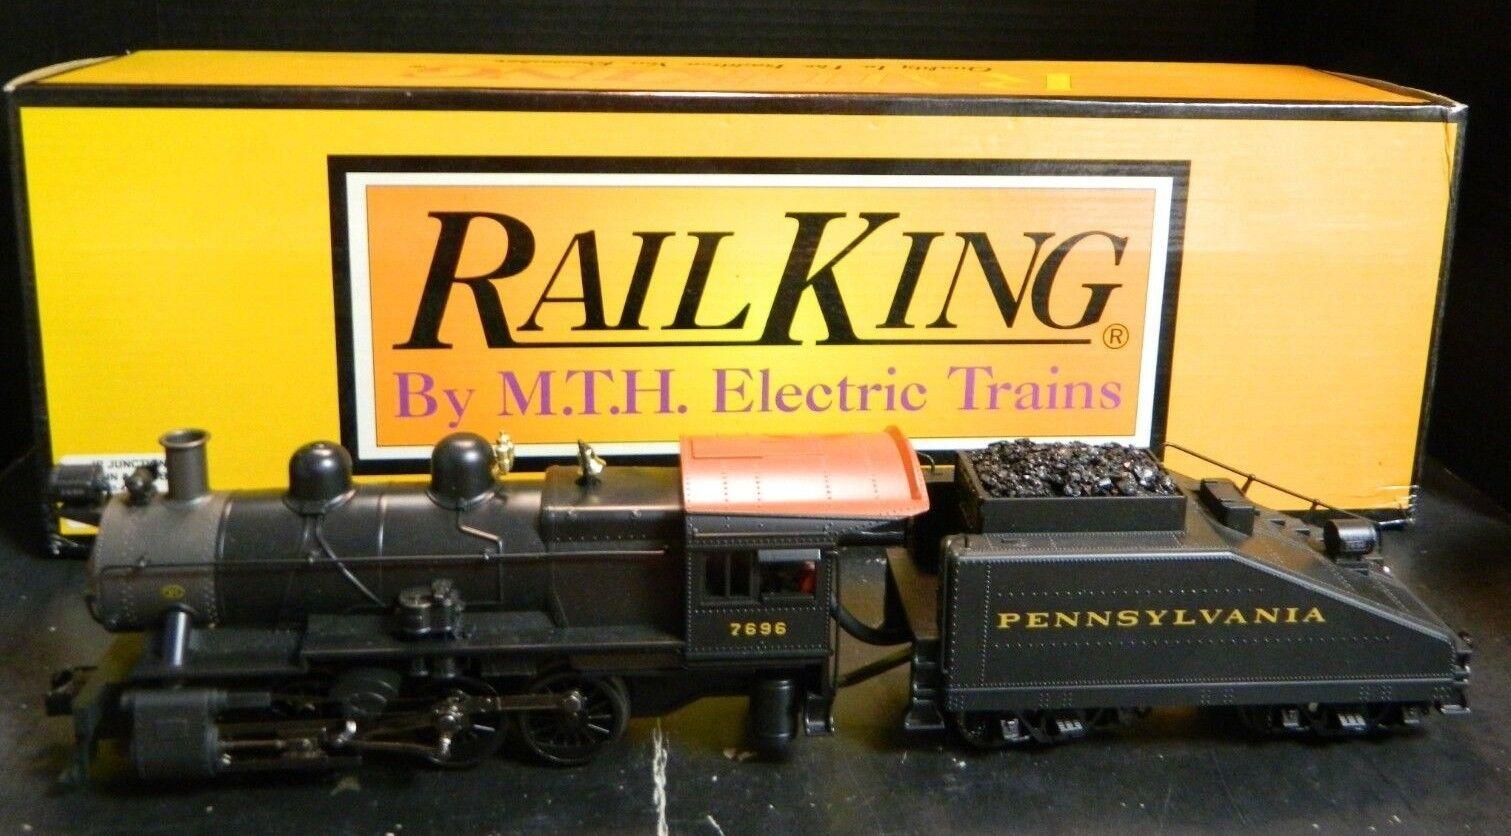 Rail King Pennsylvania 7696 Switcher Steam Engine& Tender 30-1448-1 In Orig Box